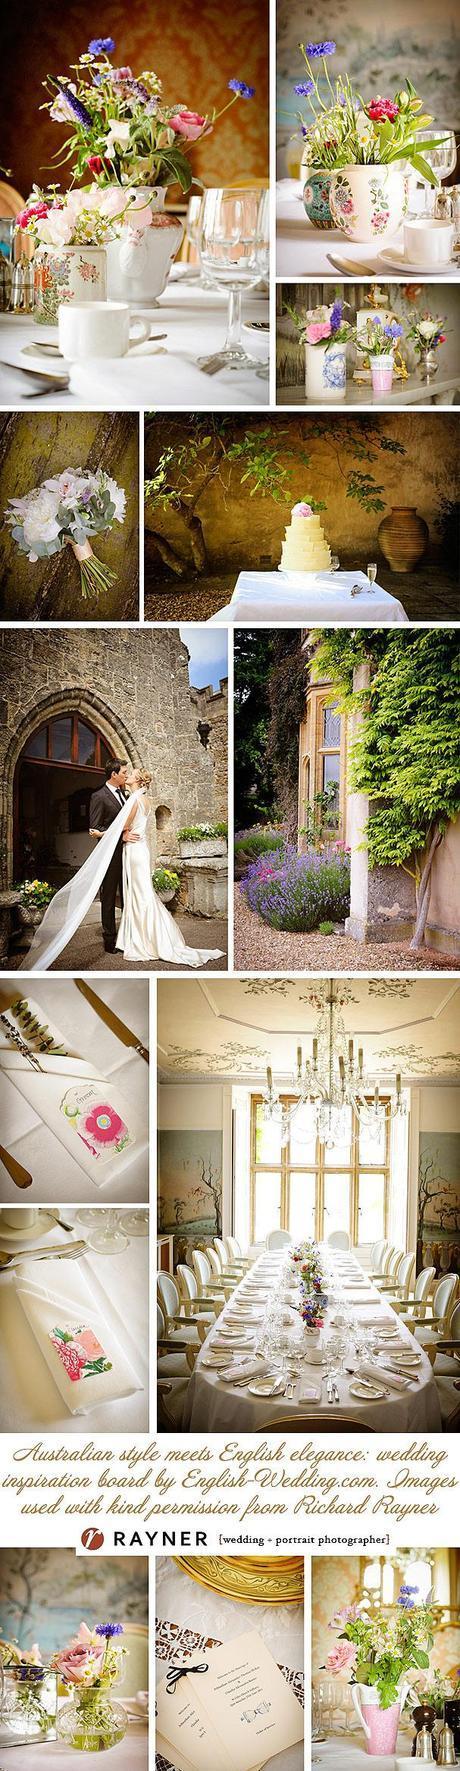 vintage countryside english wedding inspiration board